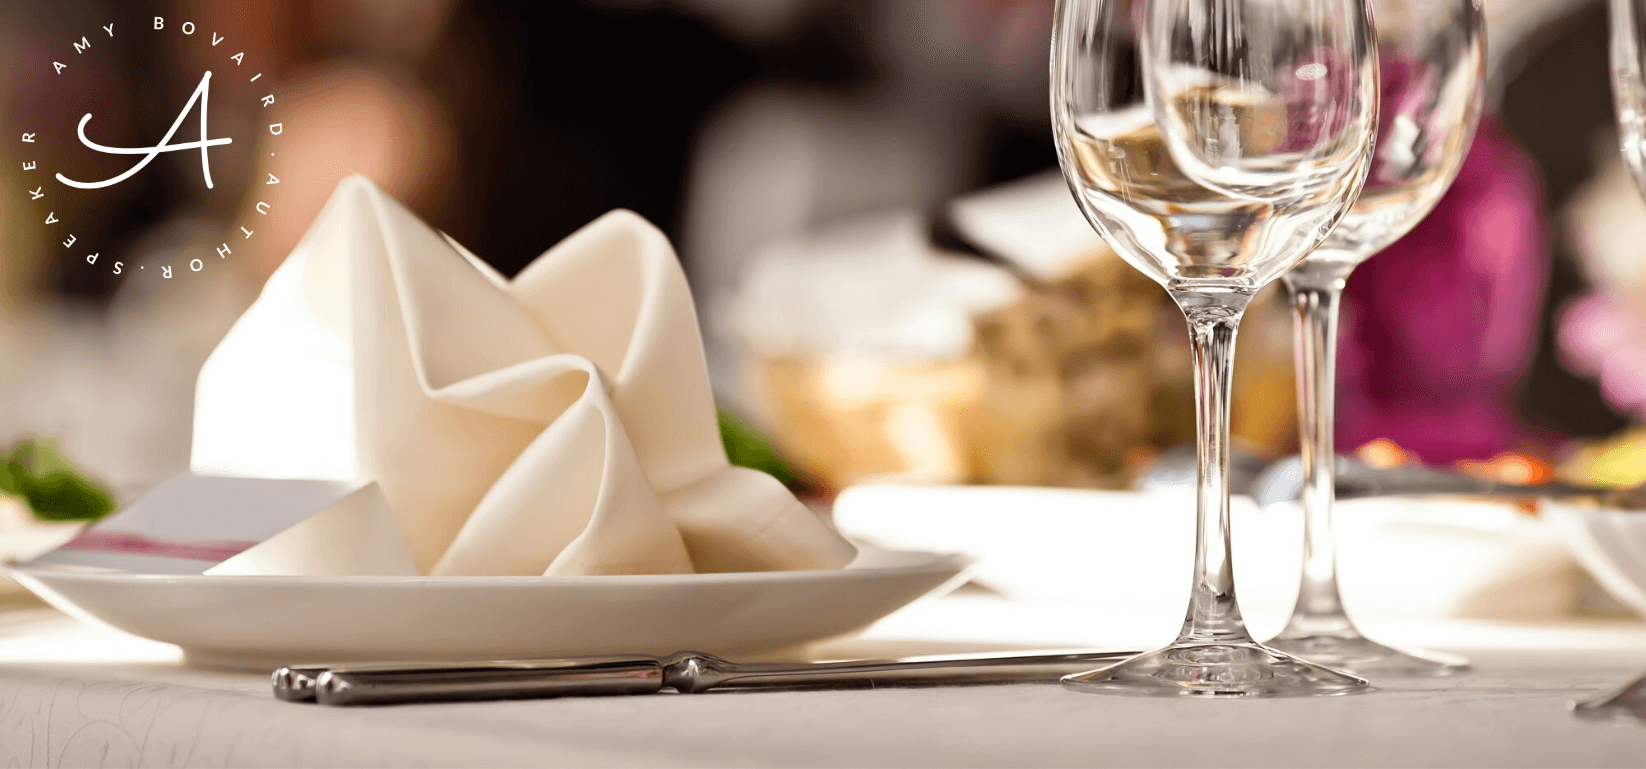 Elegant dining table place setting